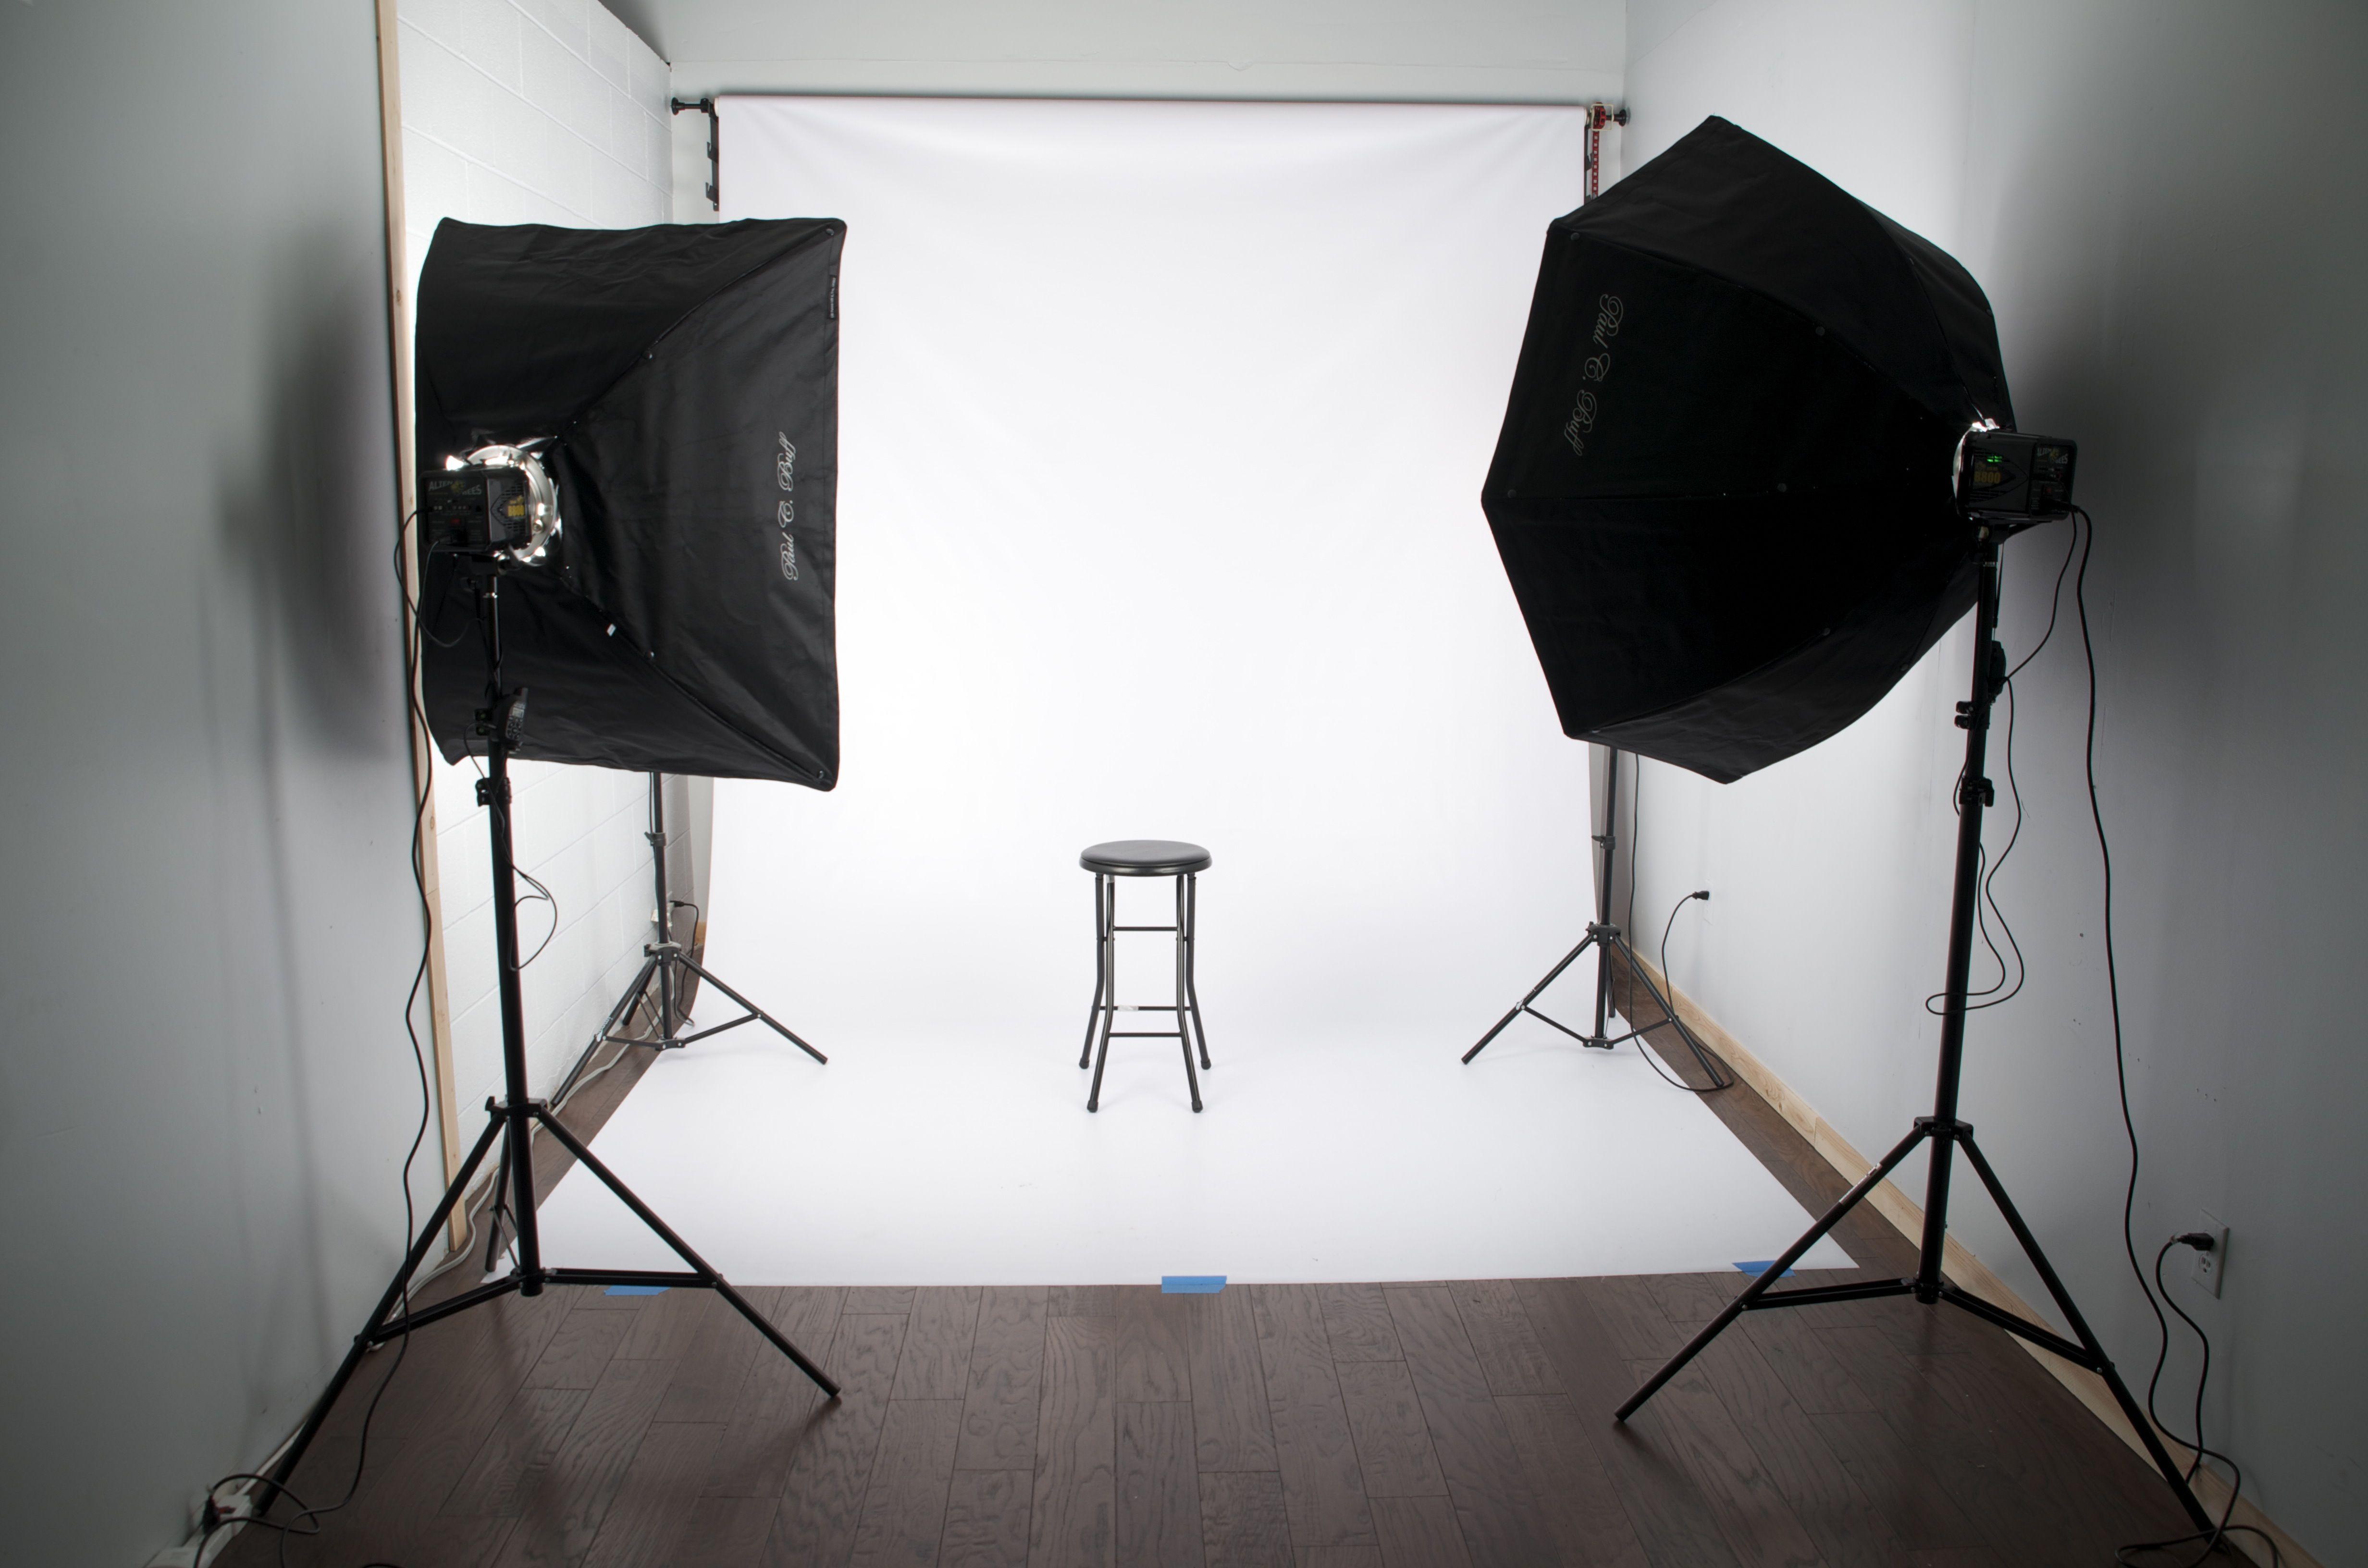 Best equipment for portrait photography